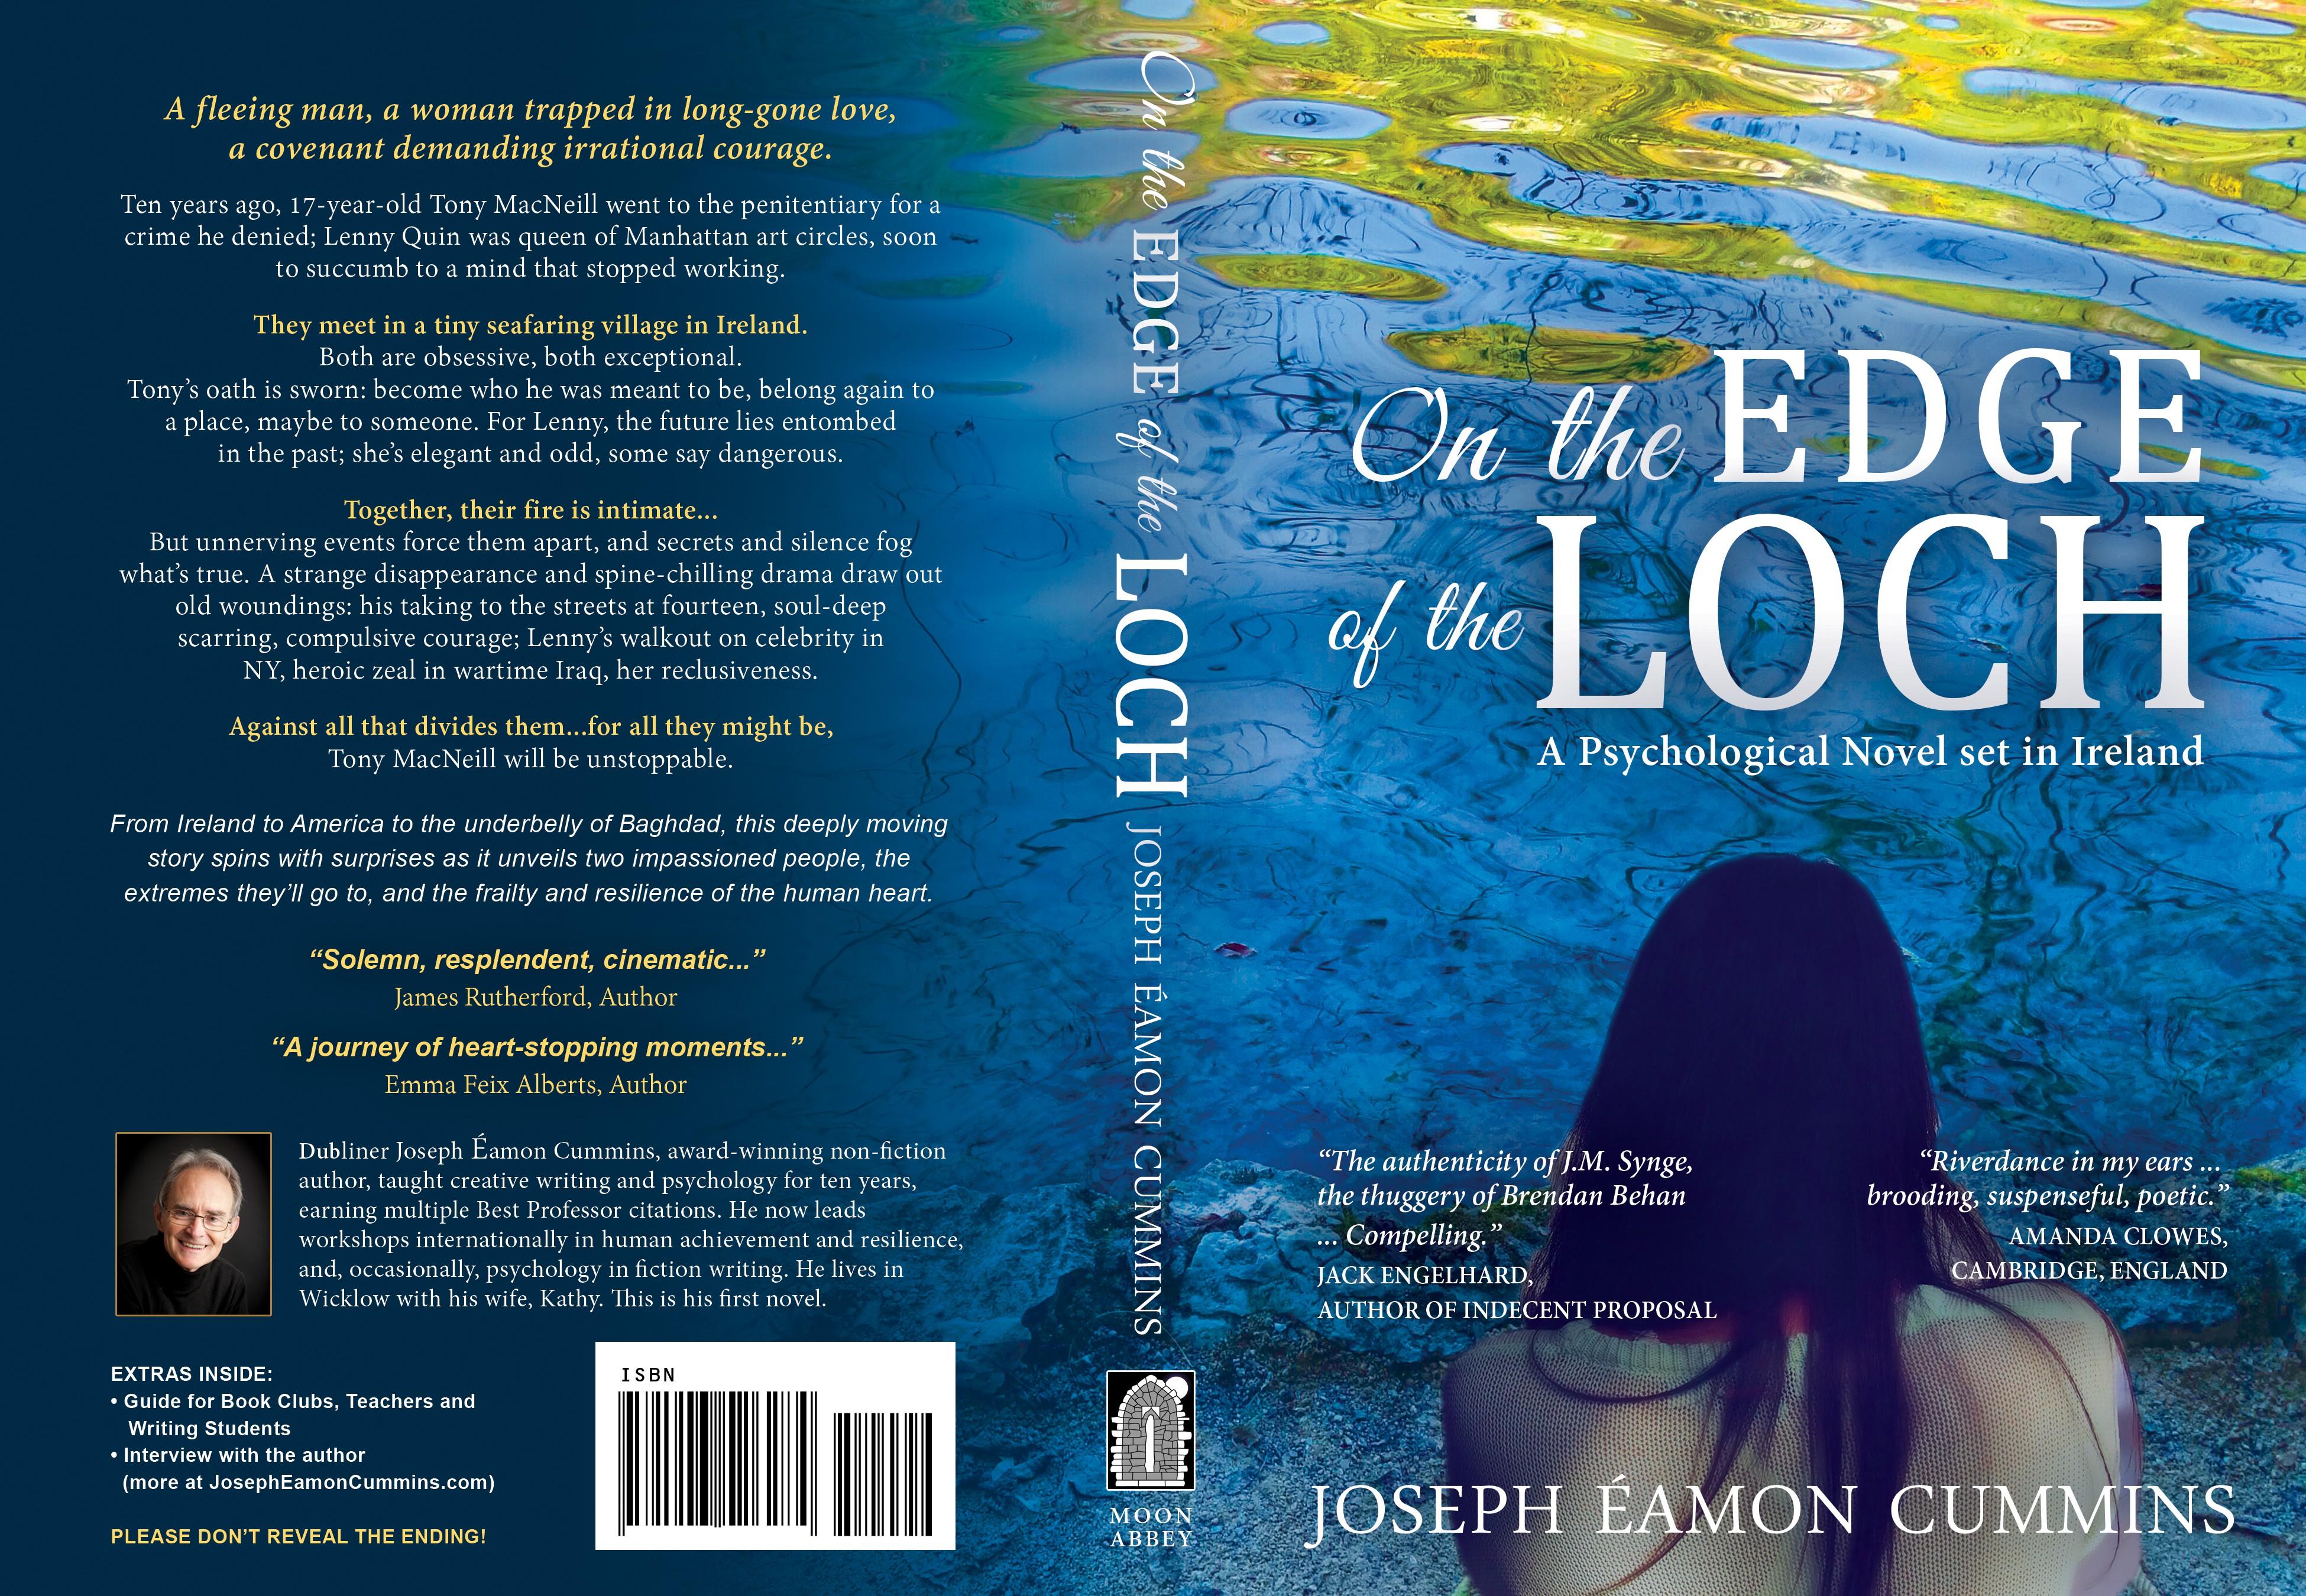 Irish Novel. Modern. Single Concept. Suggestions Provided.